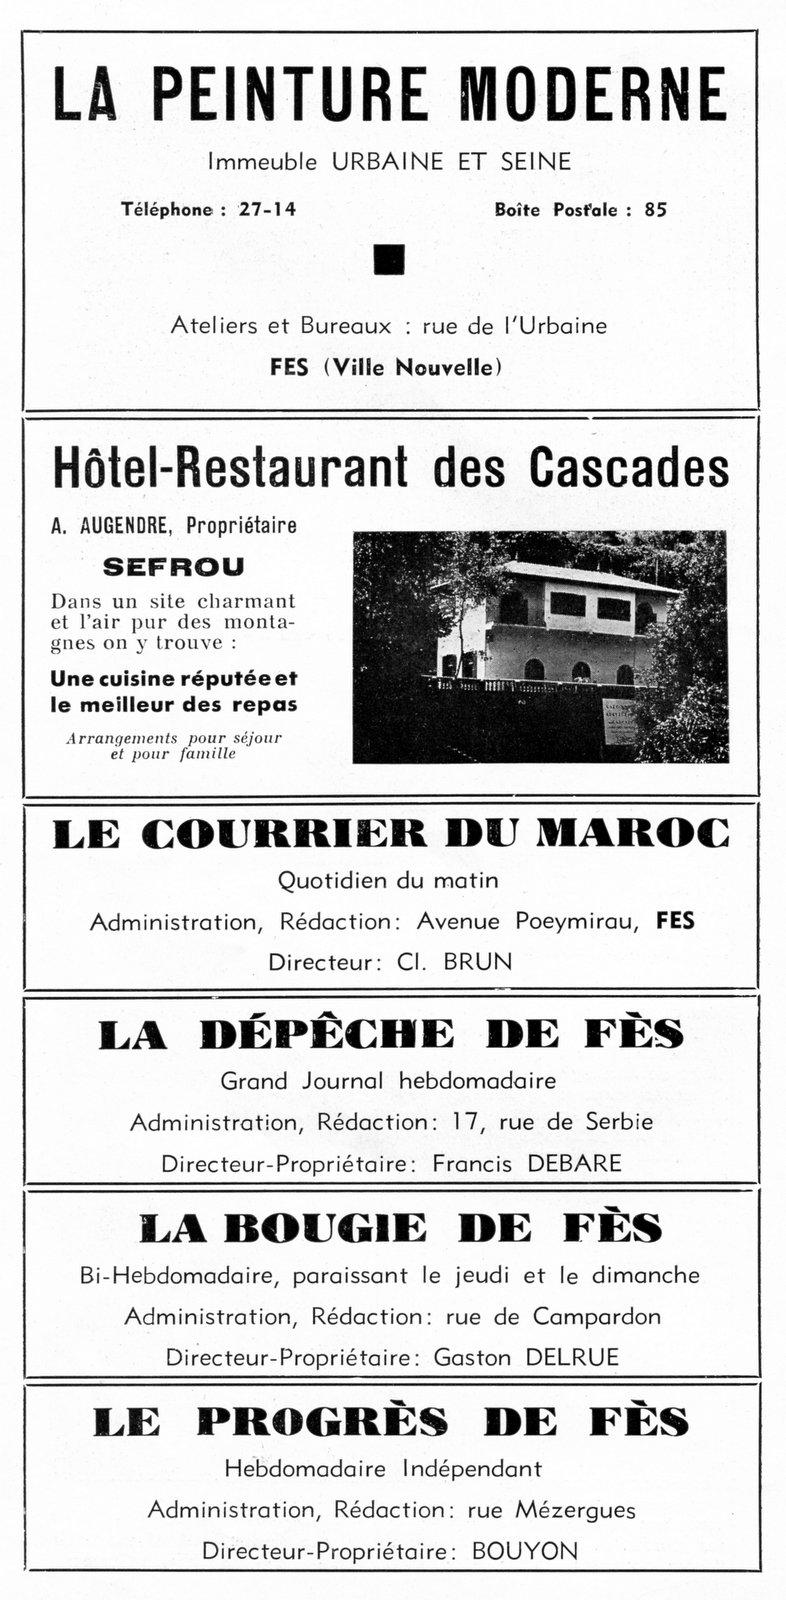 GUIDE GENERAL du MAROC - Page 8 42-gui11